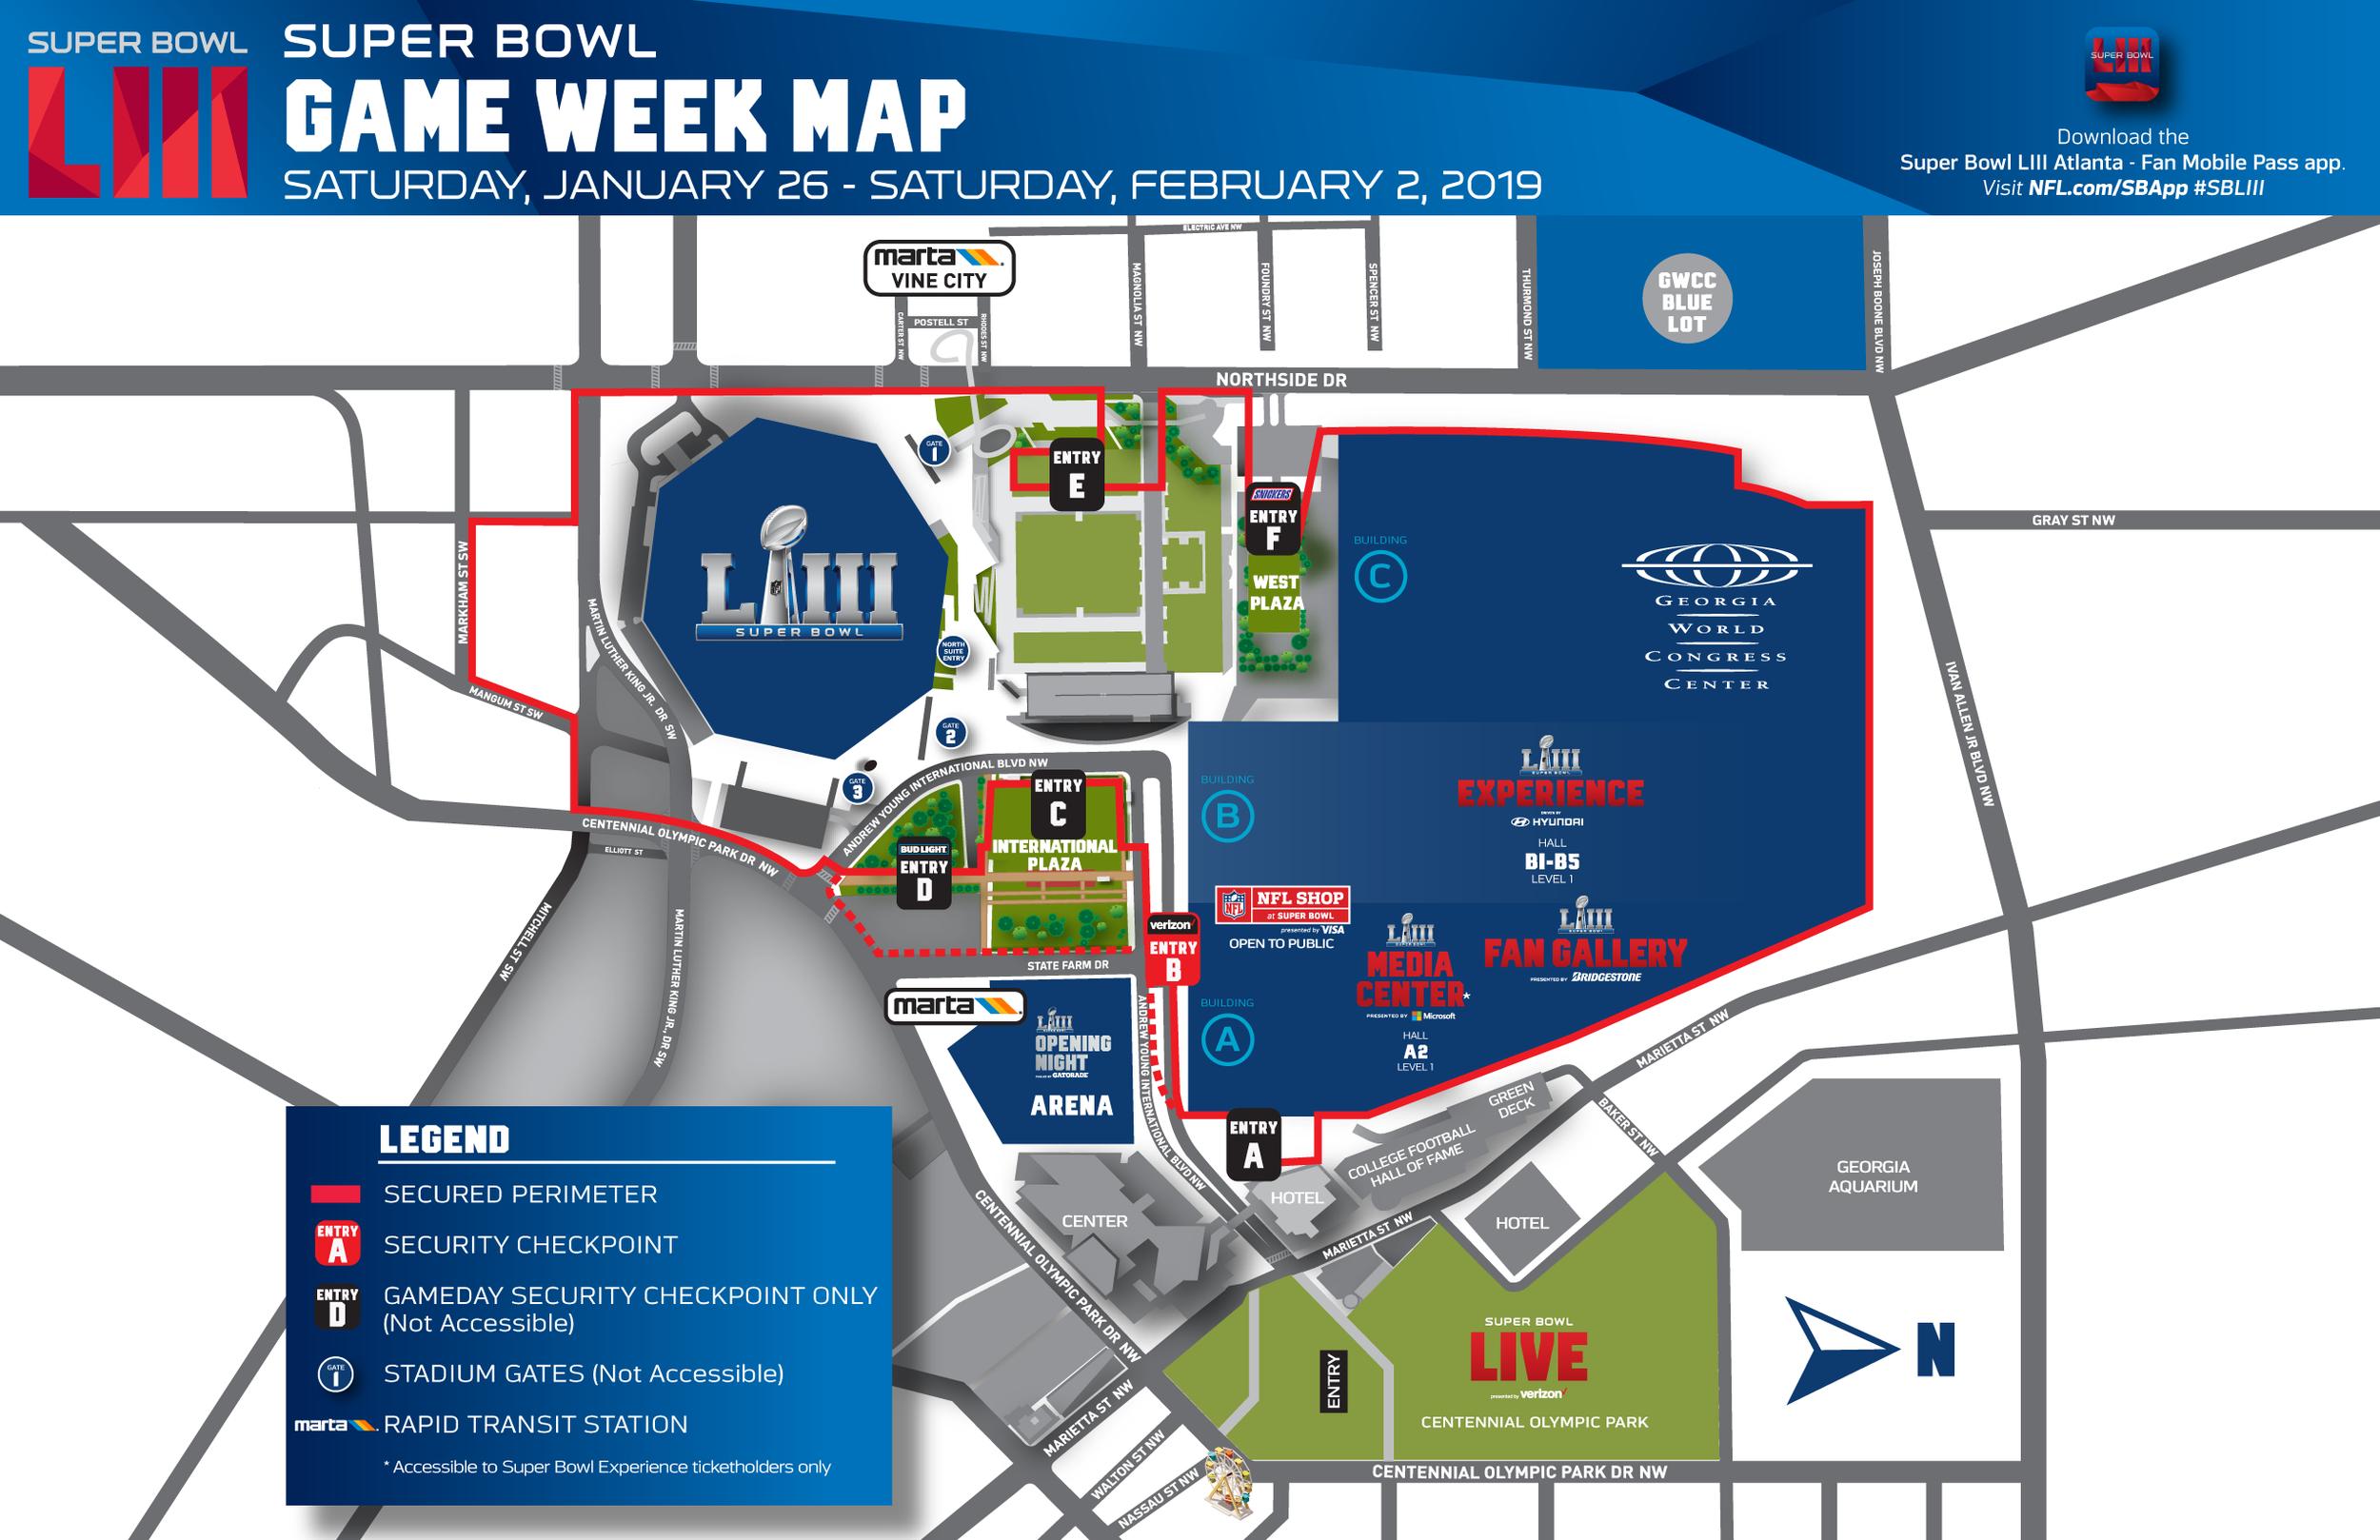 Downtown Atlanta Map - including Super Bowl Live, Super Bowl NFL Experience, Georgia World Congress Center, and Mercedes-Benz Stadium.